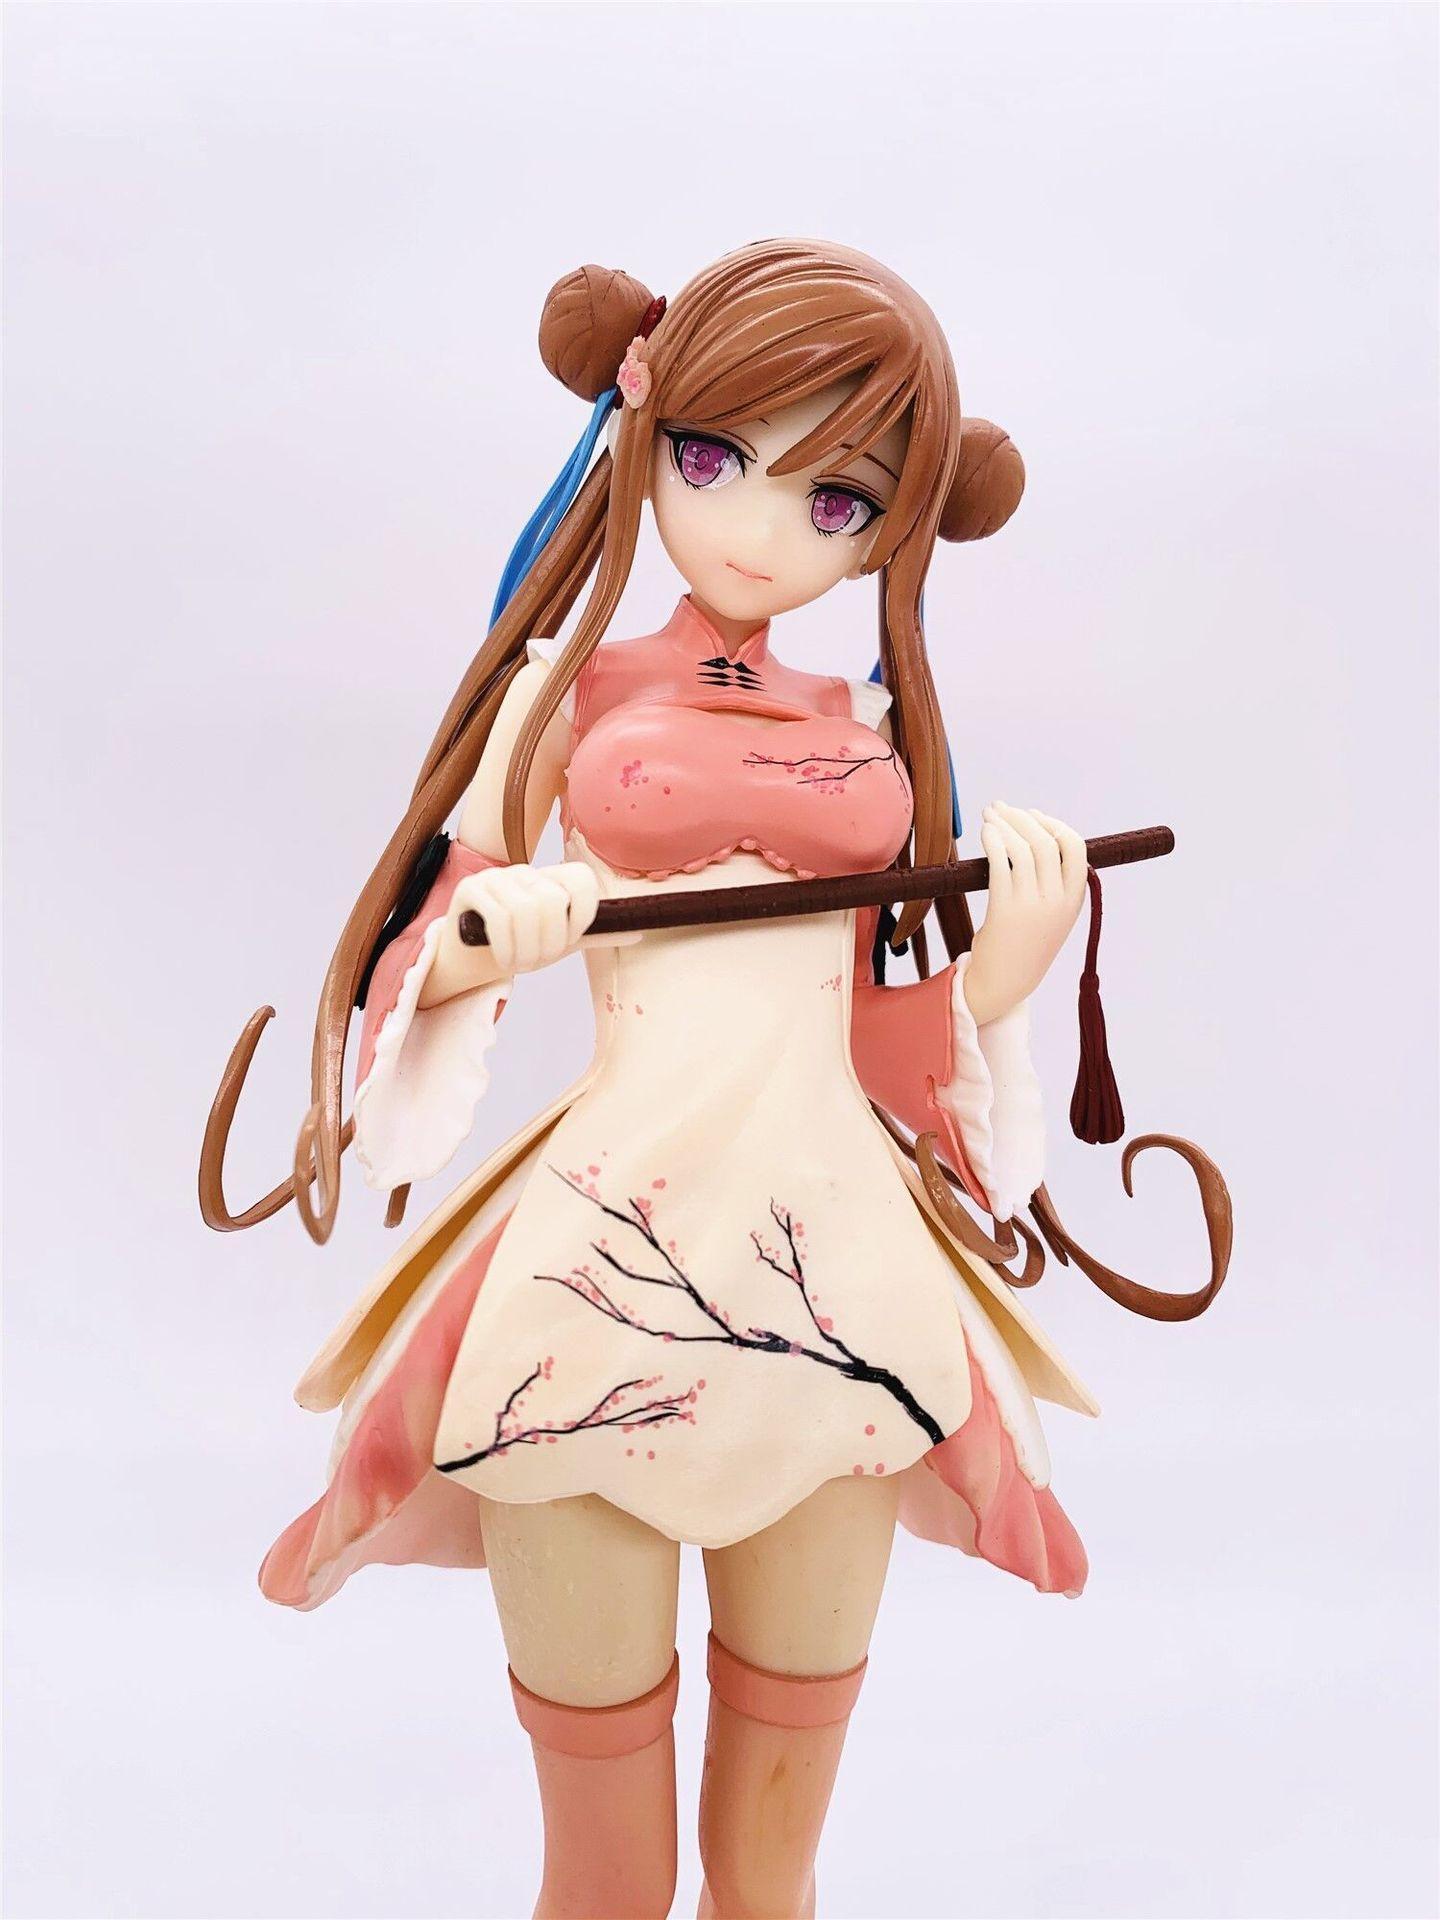 Skytube Premium-Chun Mei T2 Art Mädchen TONY Sexy Girls Standing Ver. 1/6 Skala gemalte Anime PVC Action-Figur Modell Spielzeug lelakaya T191214